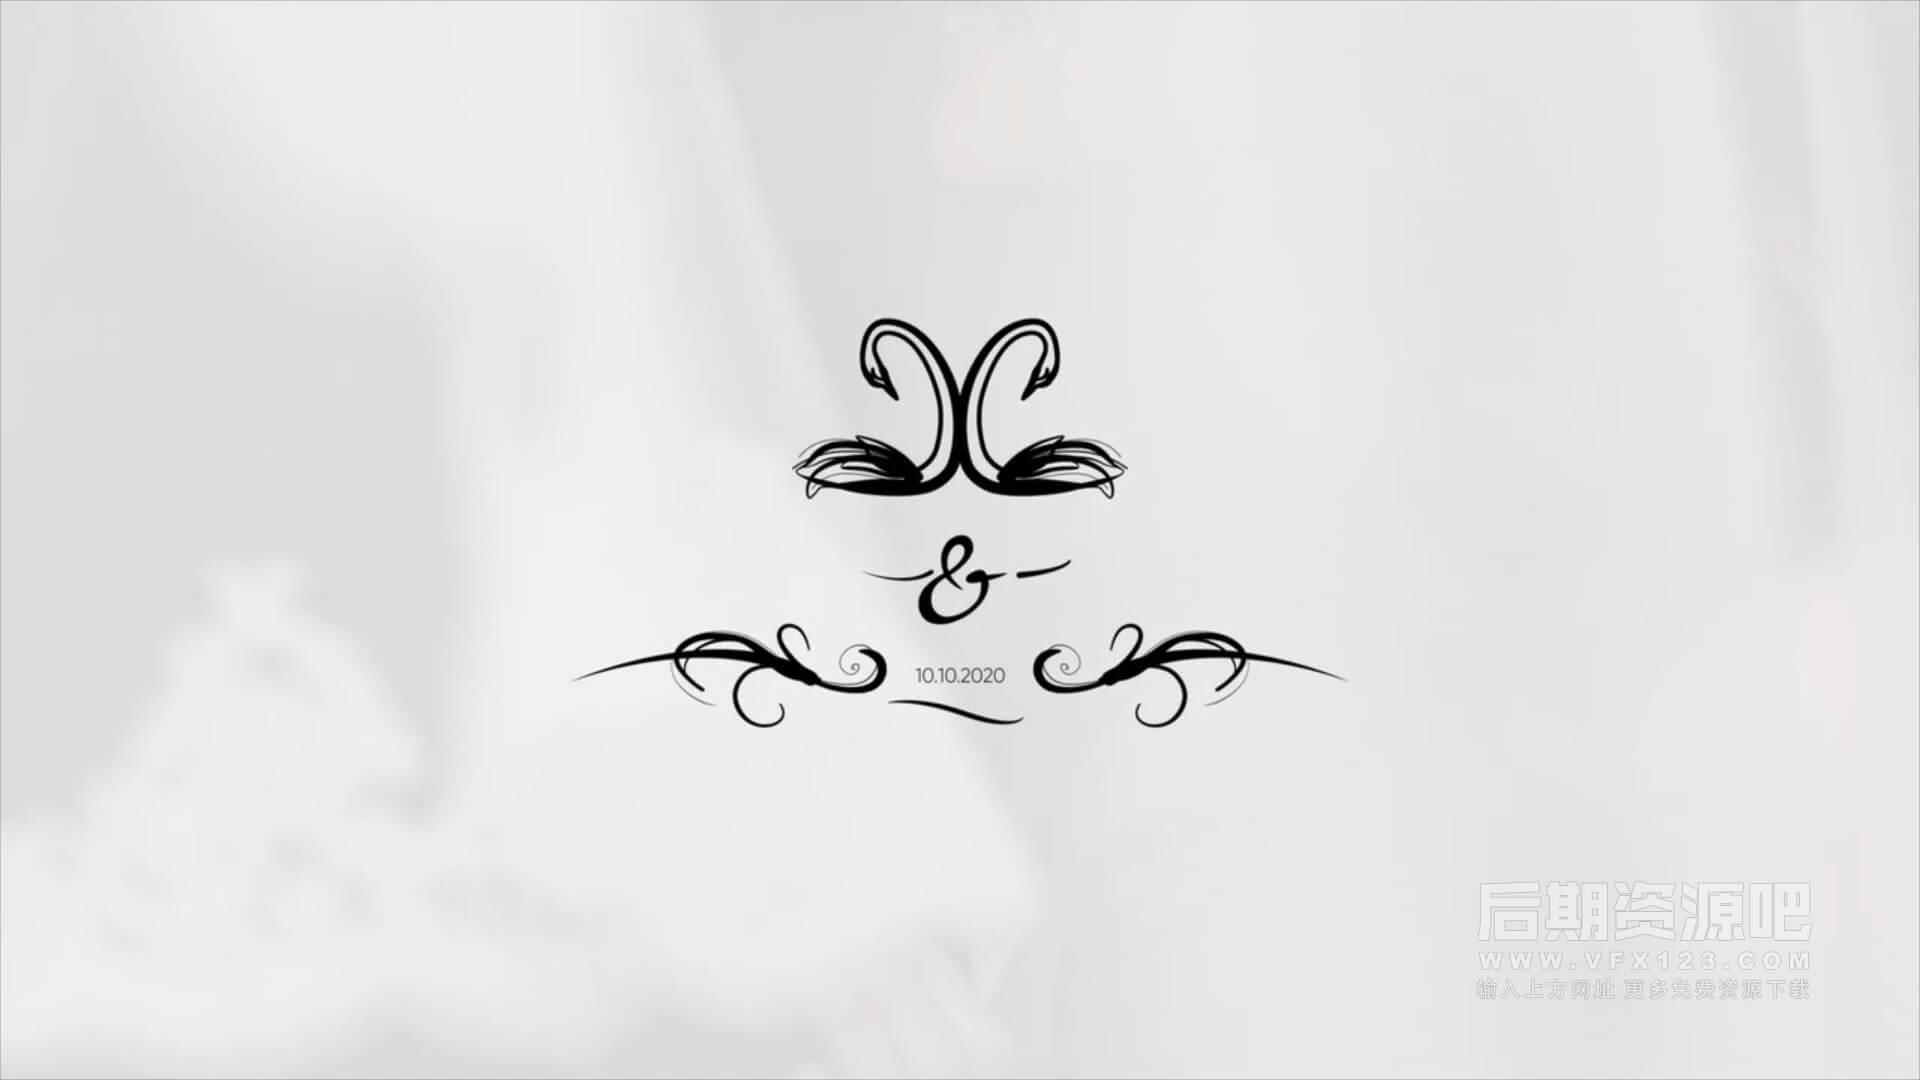 fcpx插件 4K时尚手绘婚礼标题人名日期模板 Wedding Titles